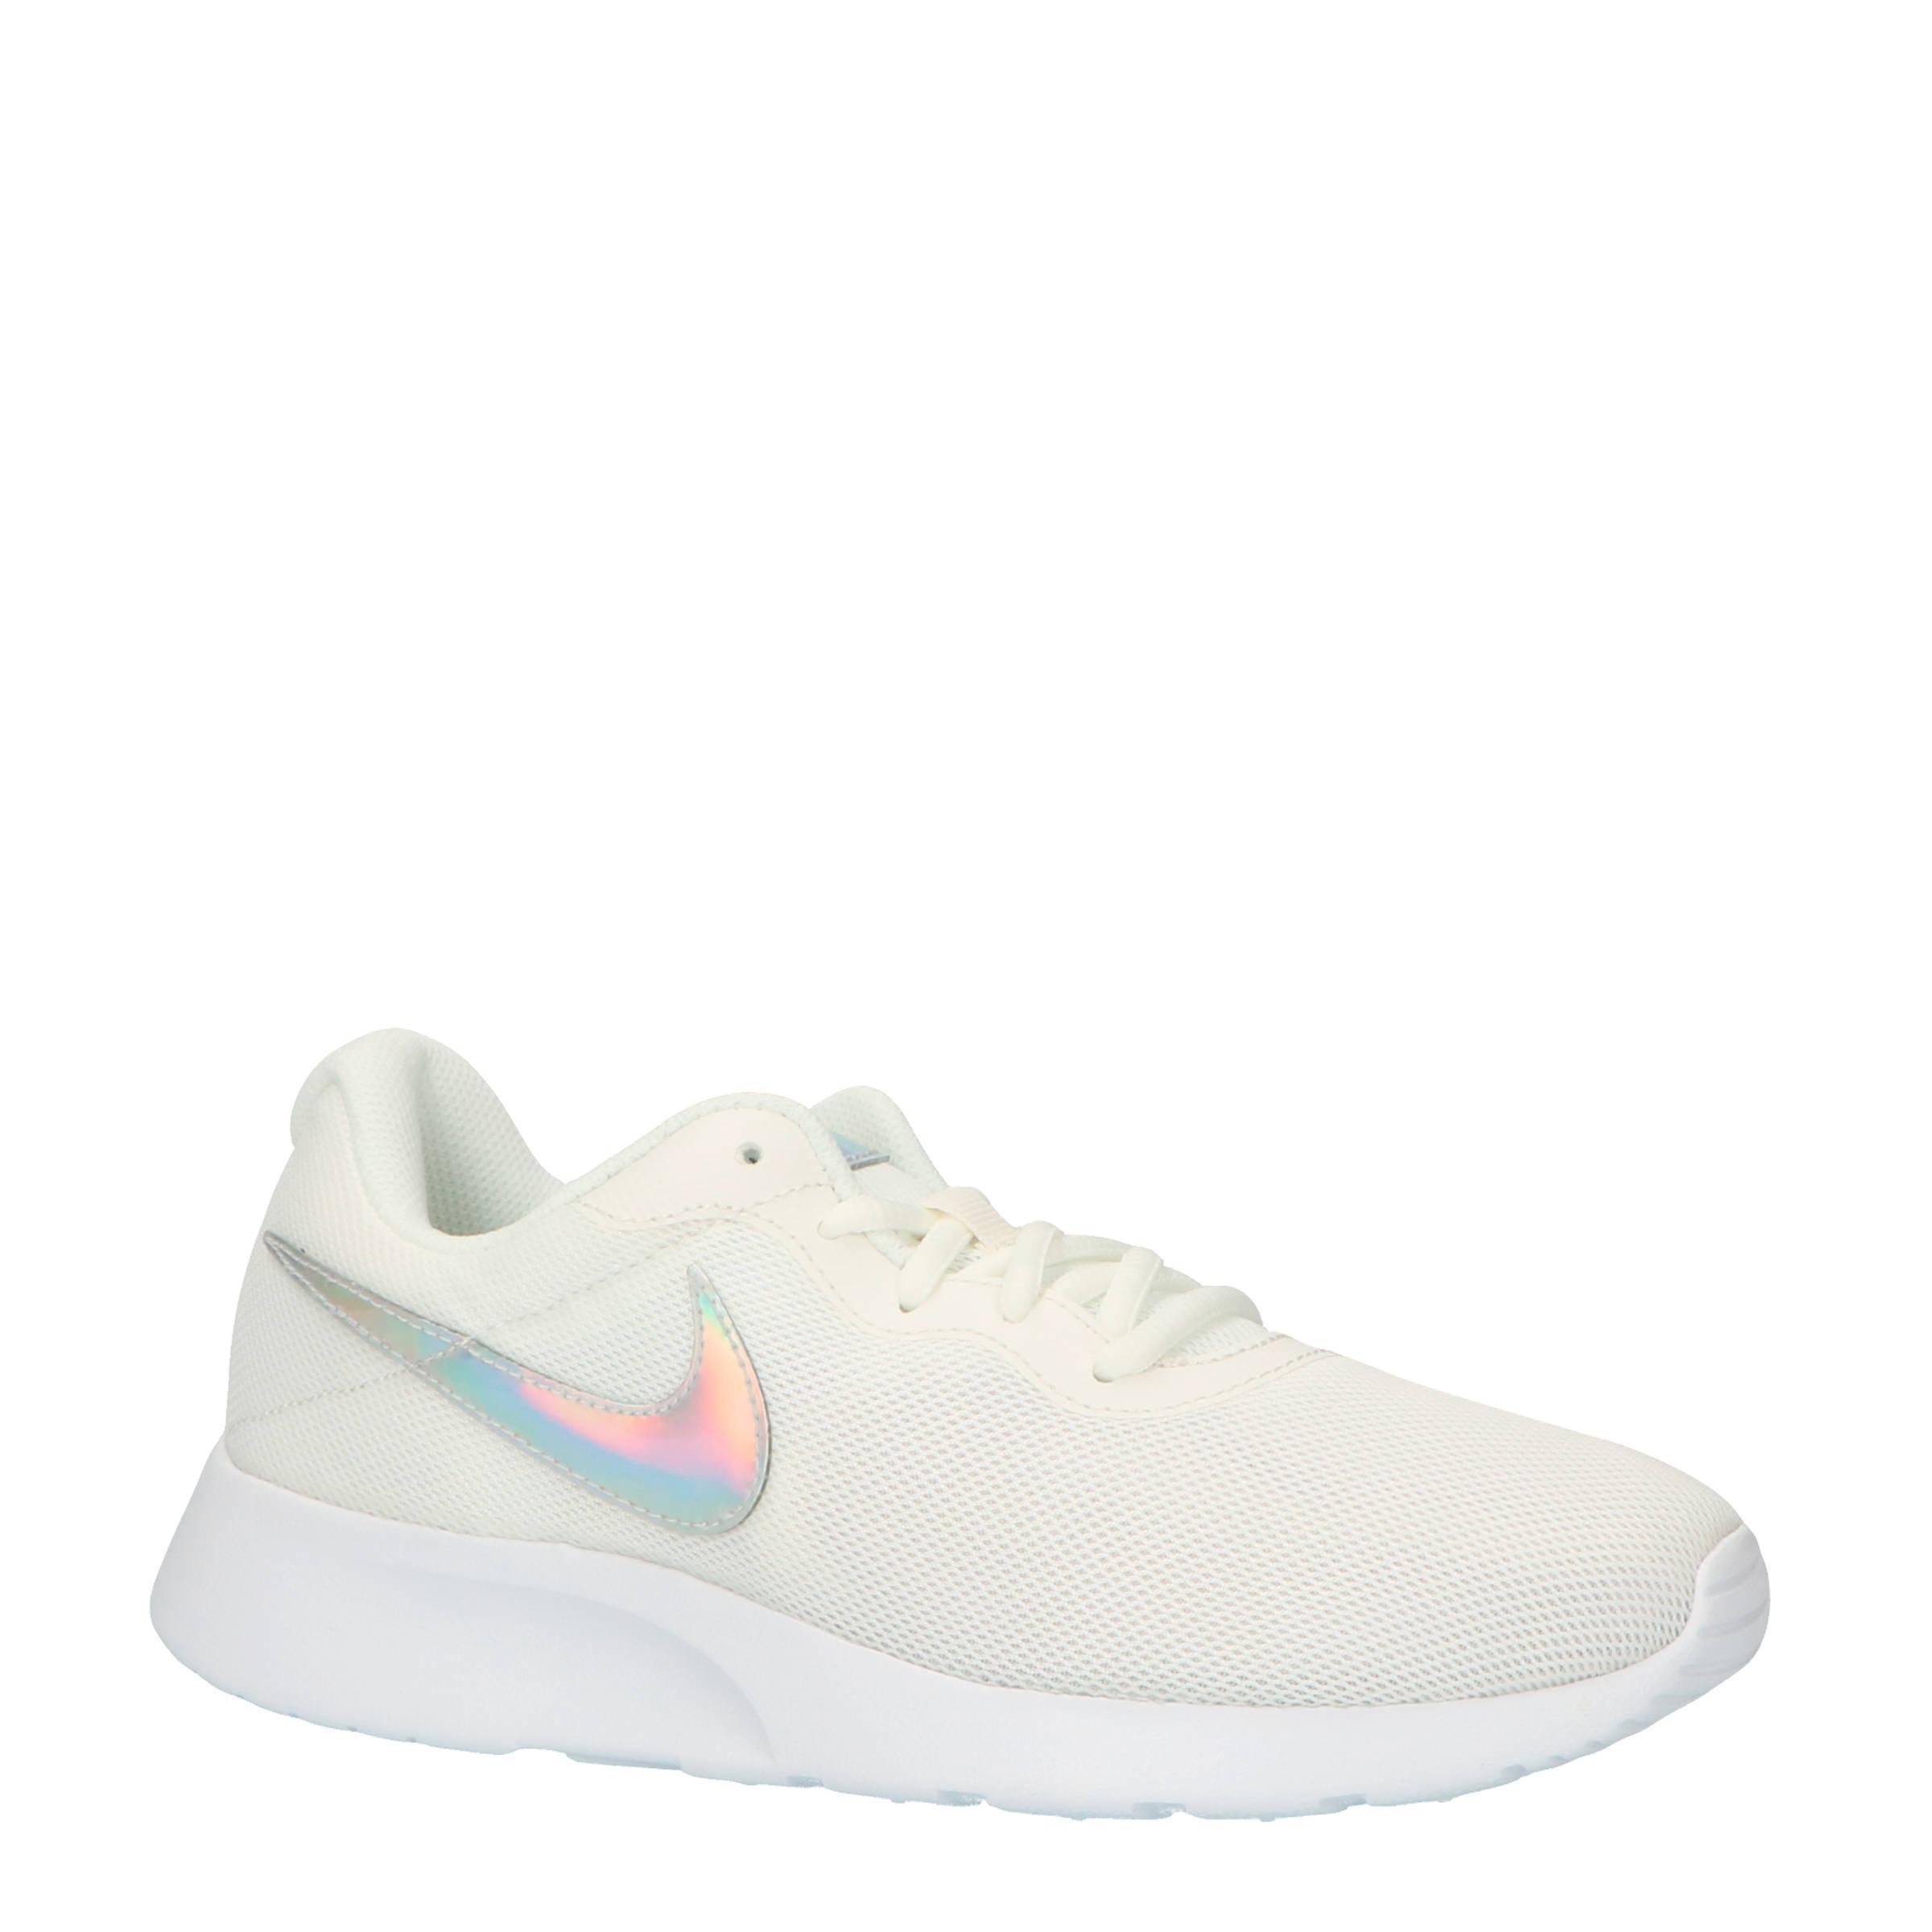 Nike Wehkamp Nike Tanjun Nike Tanjun Tanjun Sneakers Wehkamp Witzilver Wehkamp Sneakers Witzilver Nike Witzilver Sneakers axB5qw